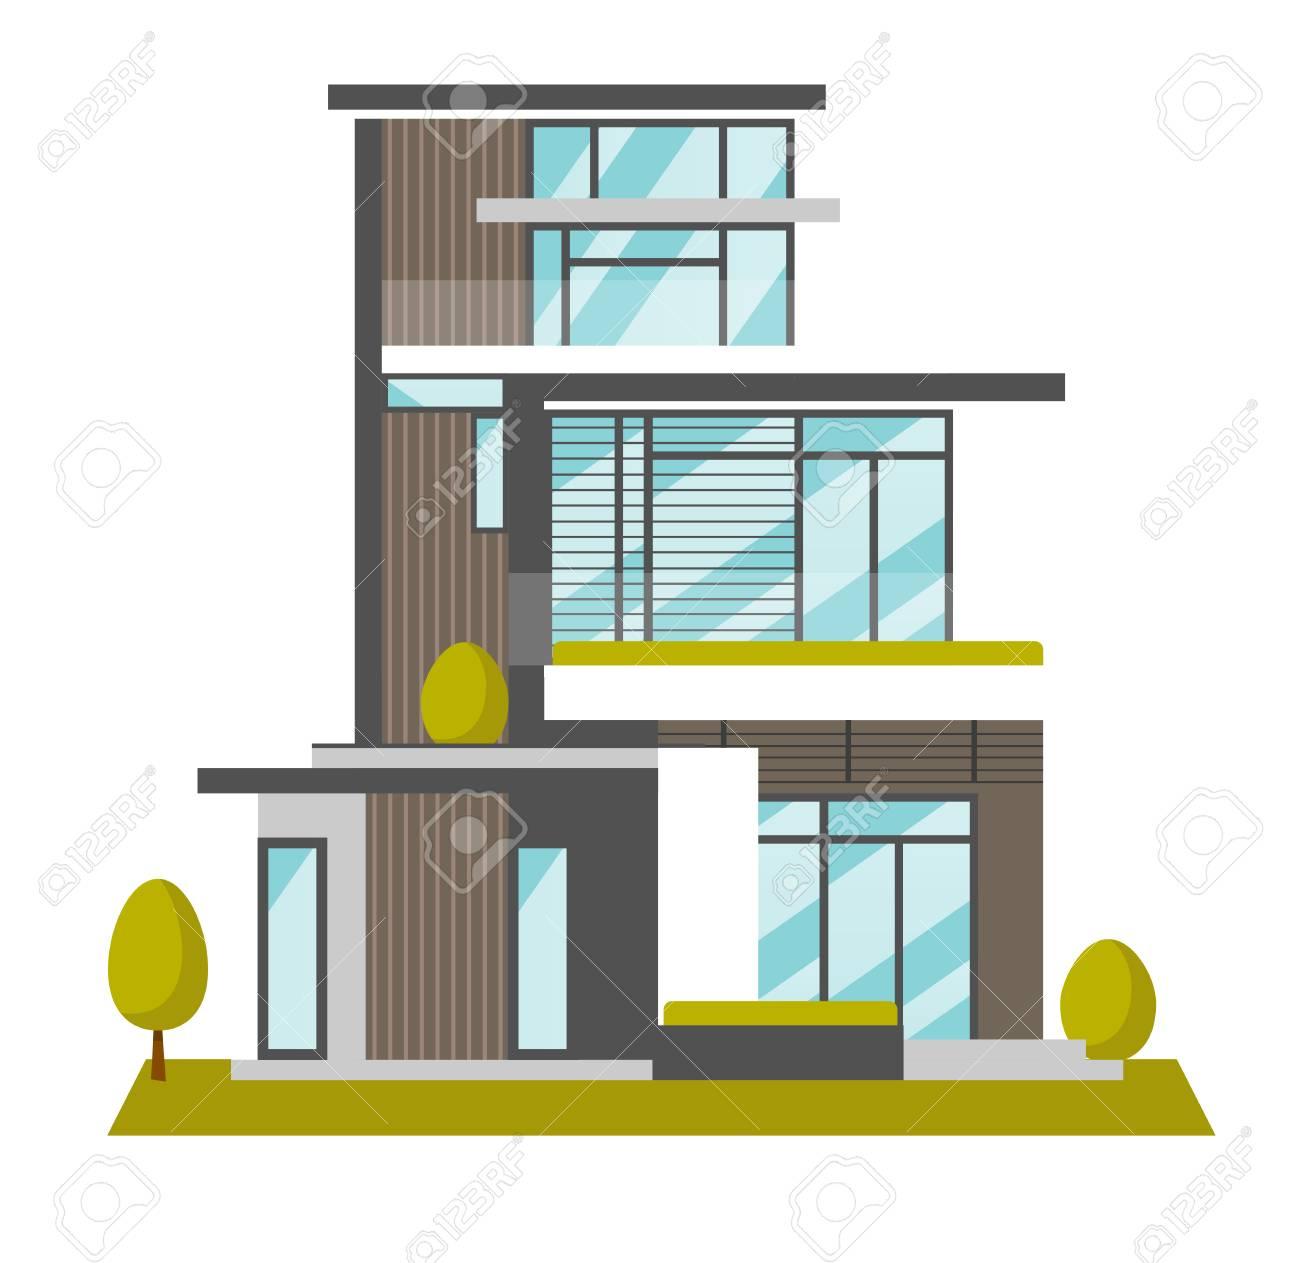 Grande Maison Moderne Avec Beaucoup De Windows Vector Illustration